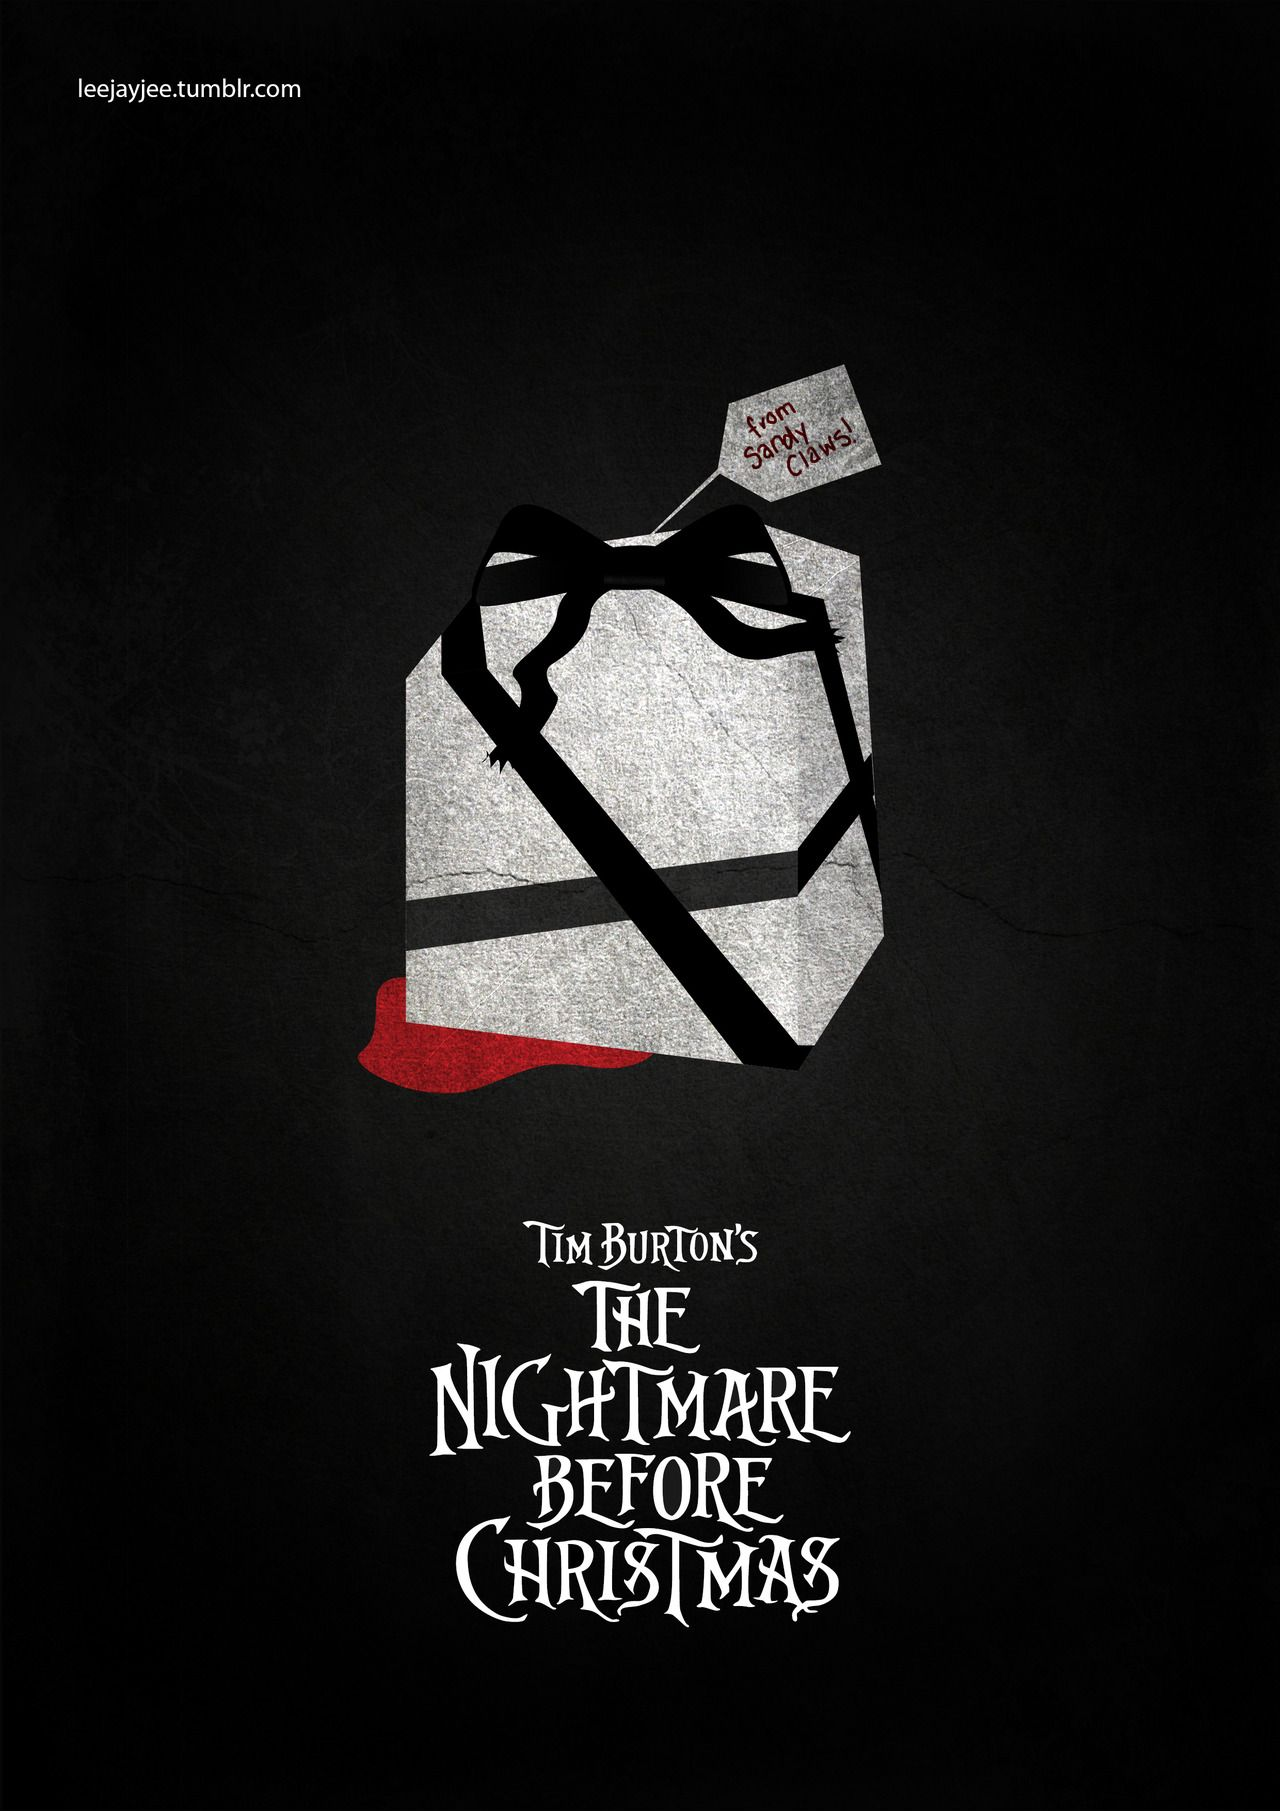 The Nightmare Before Christmas | Music & Movies | Pinterest | Tim burton